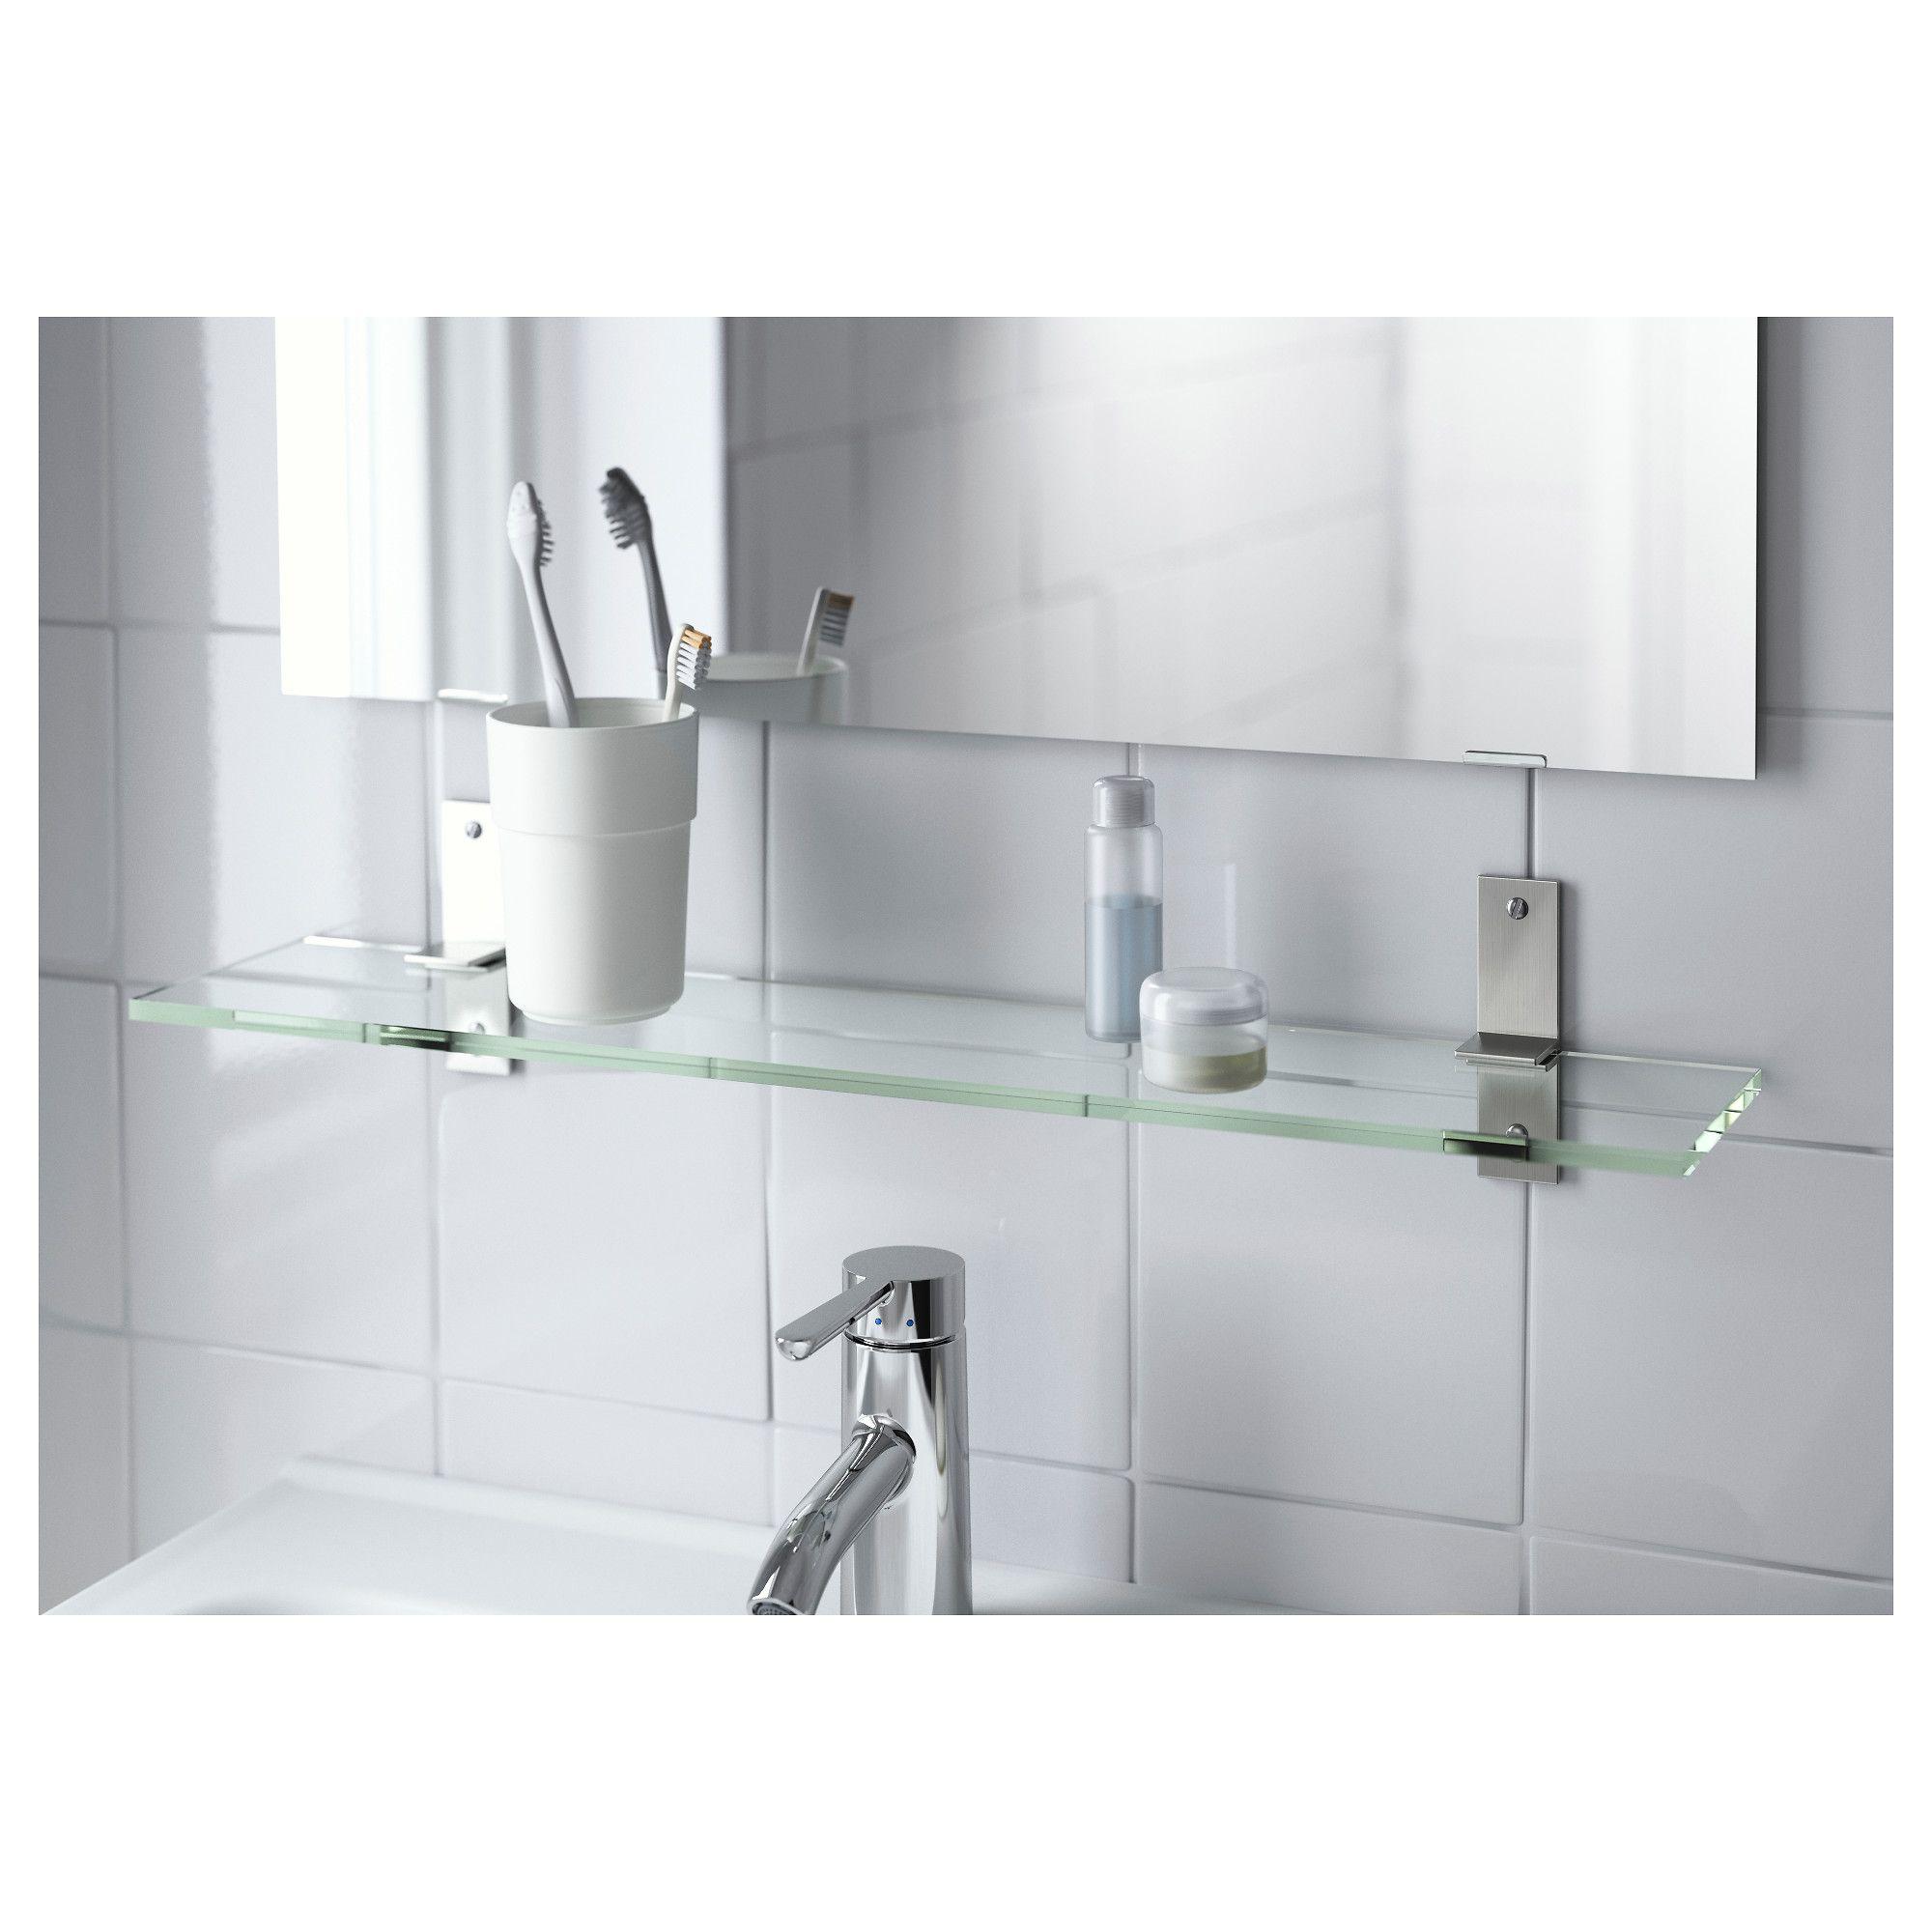 IKEA GRUNDTAL glass shelf Tempered glass - extra resistant to heat ...